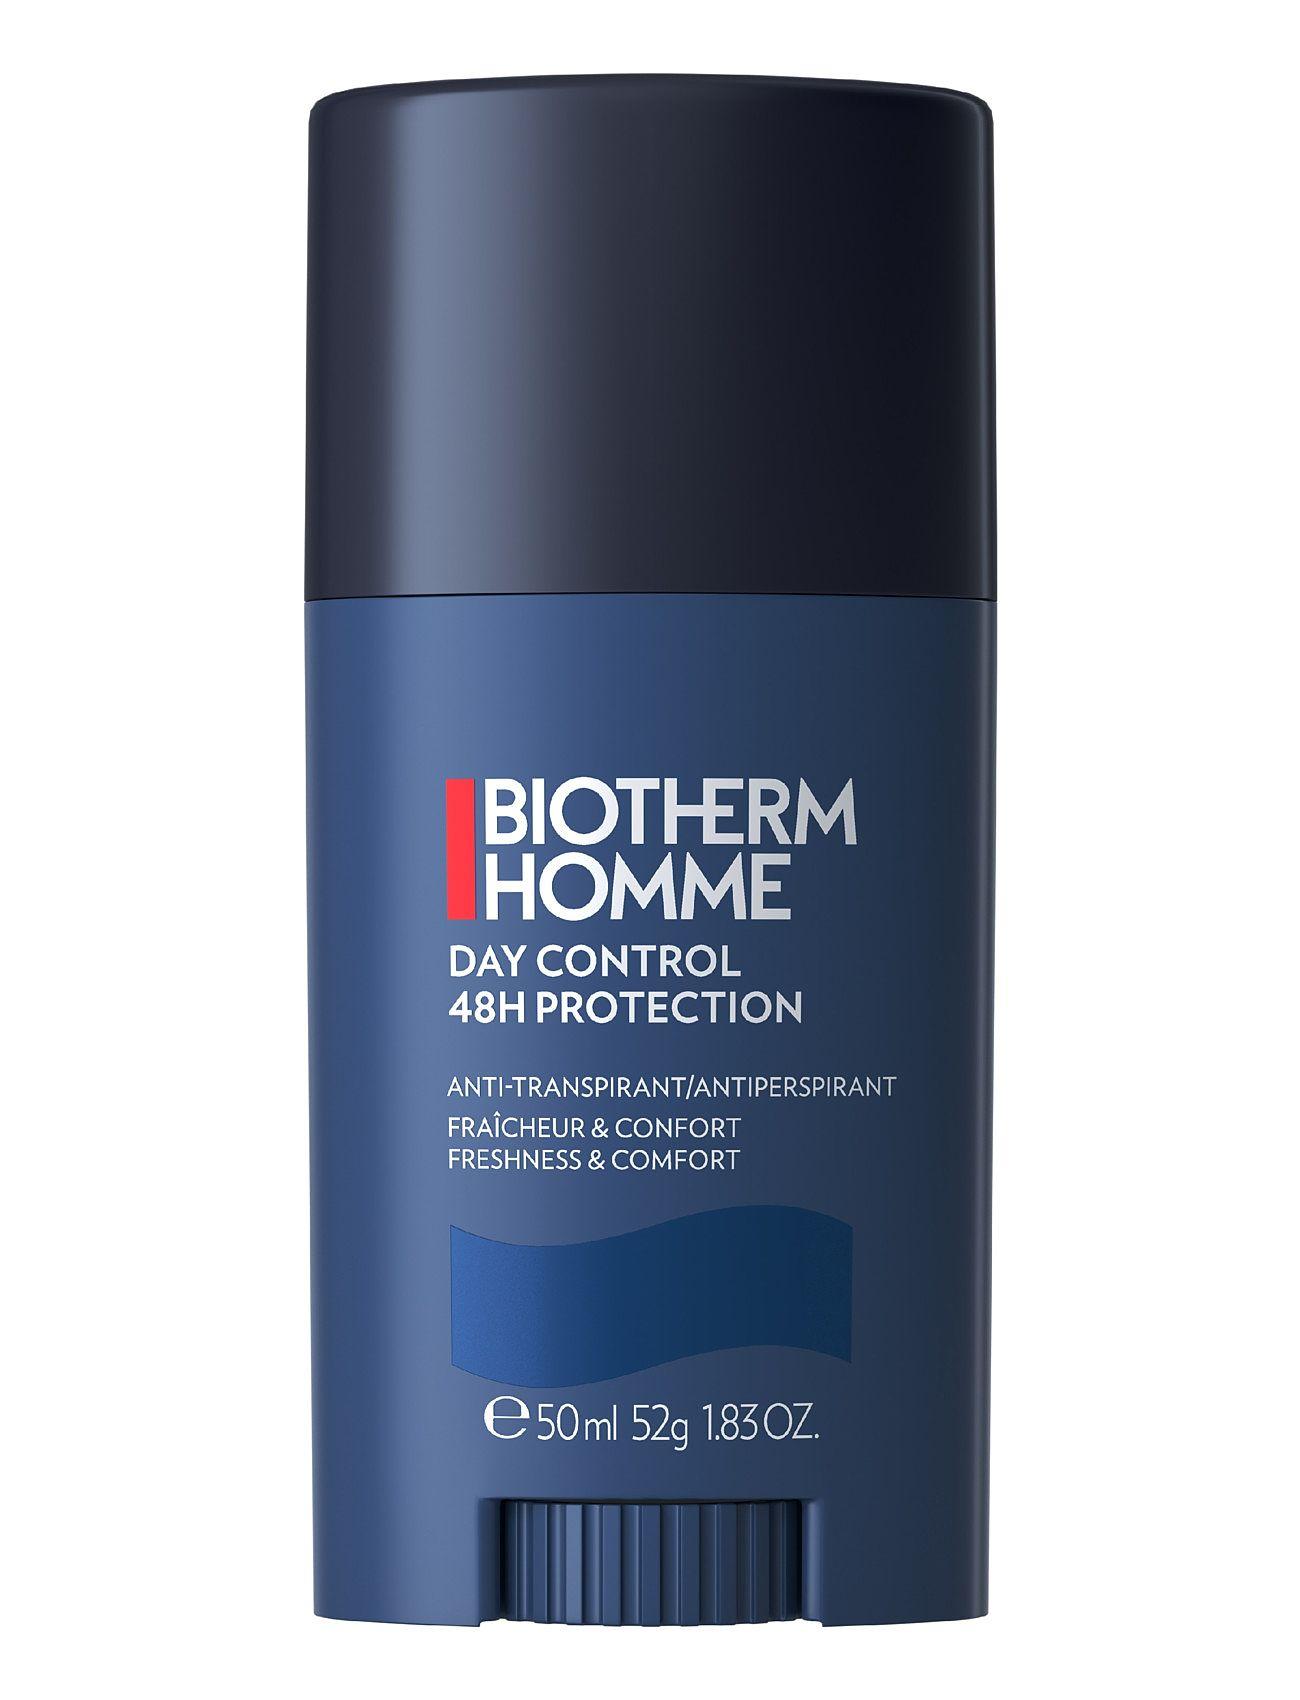 biotherm Day control stick 50 ml på boozt.com dk